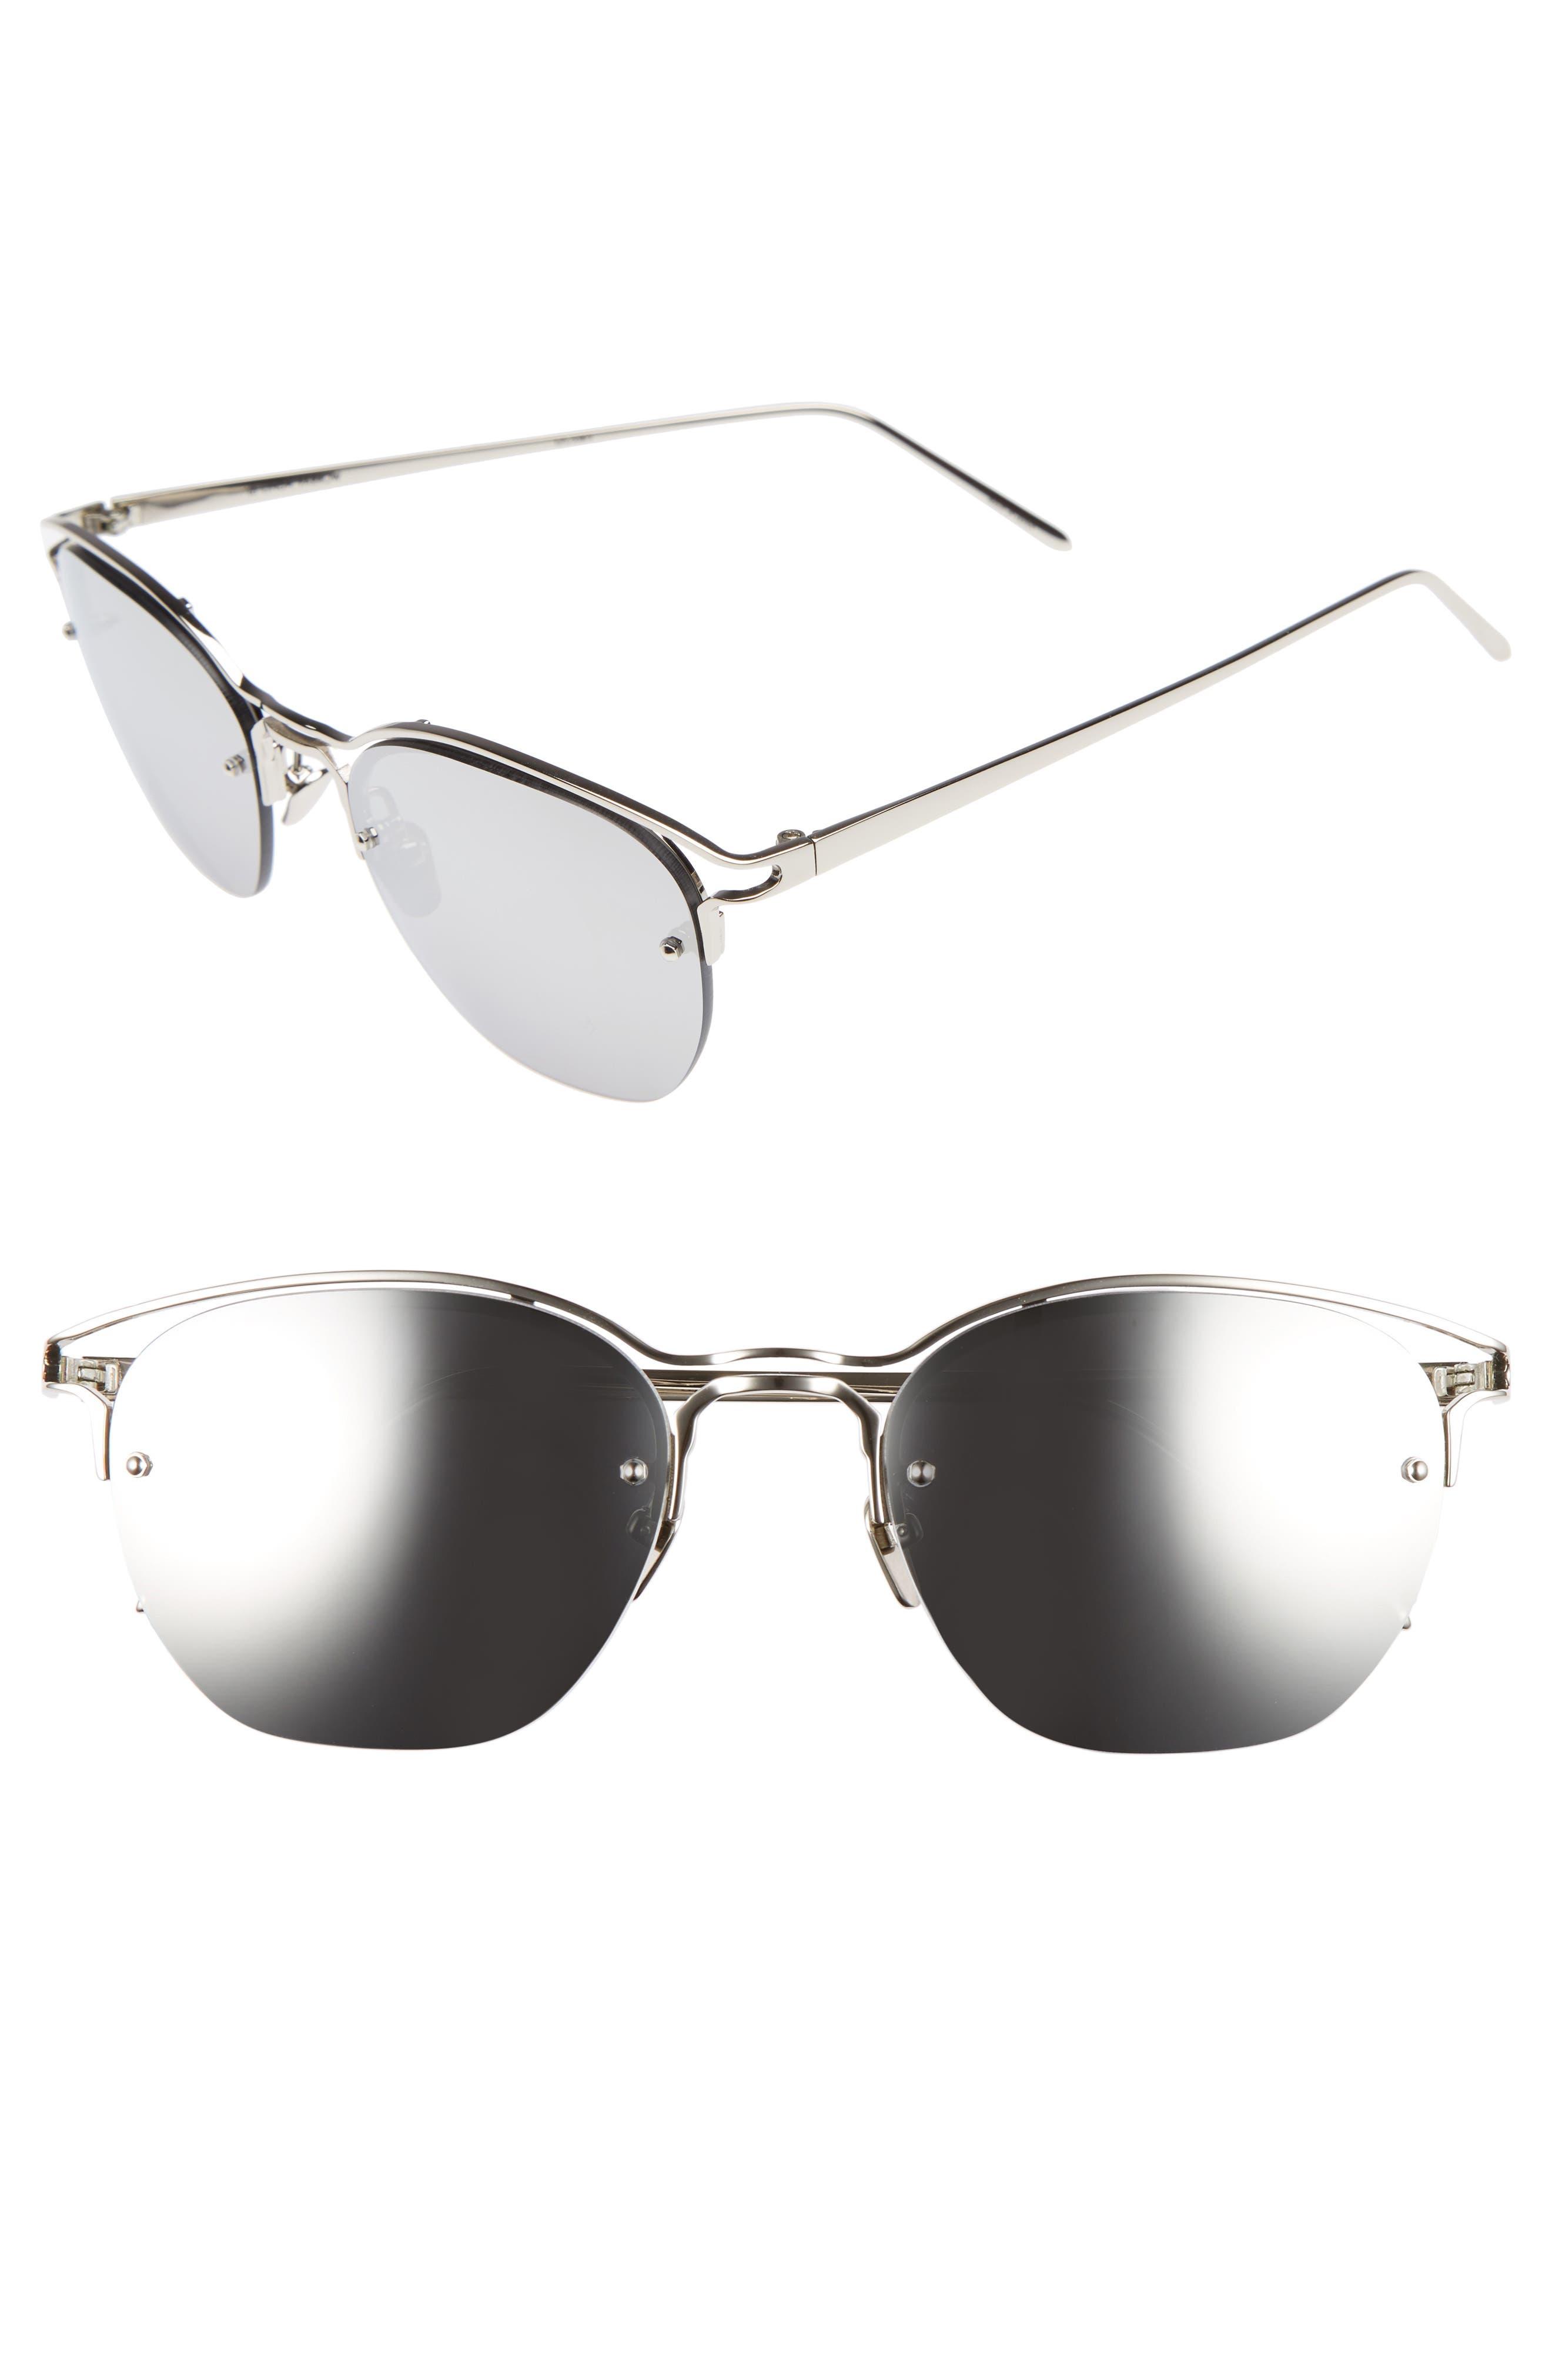 55mm Round Sunglasses,                         Main,                         color, White Gold/ Platinum